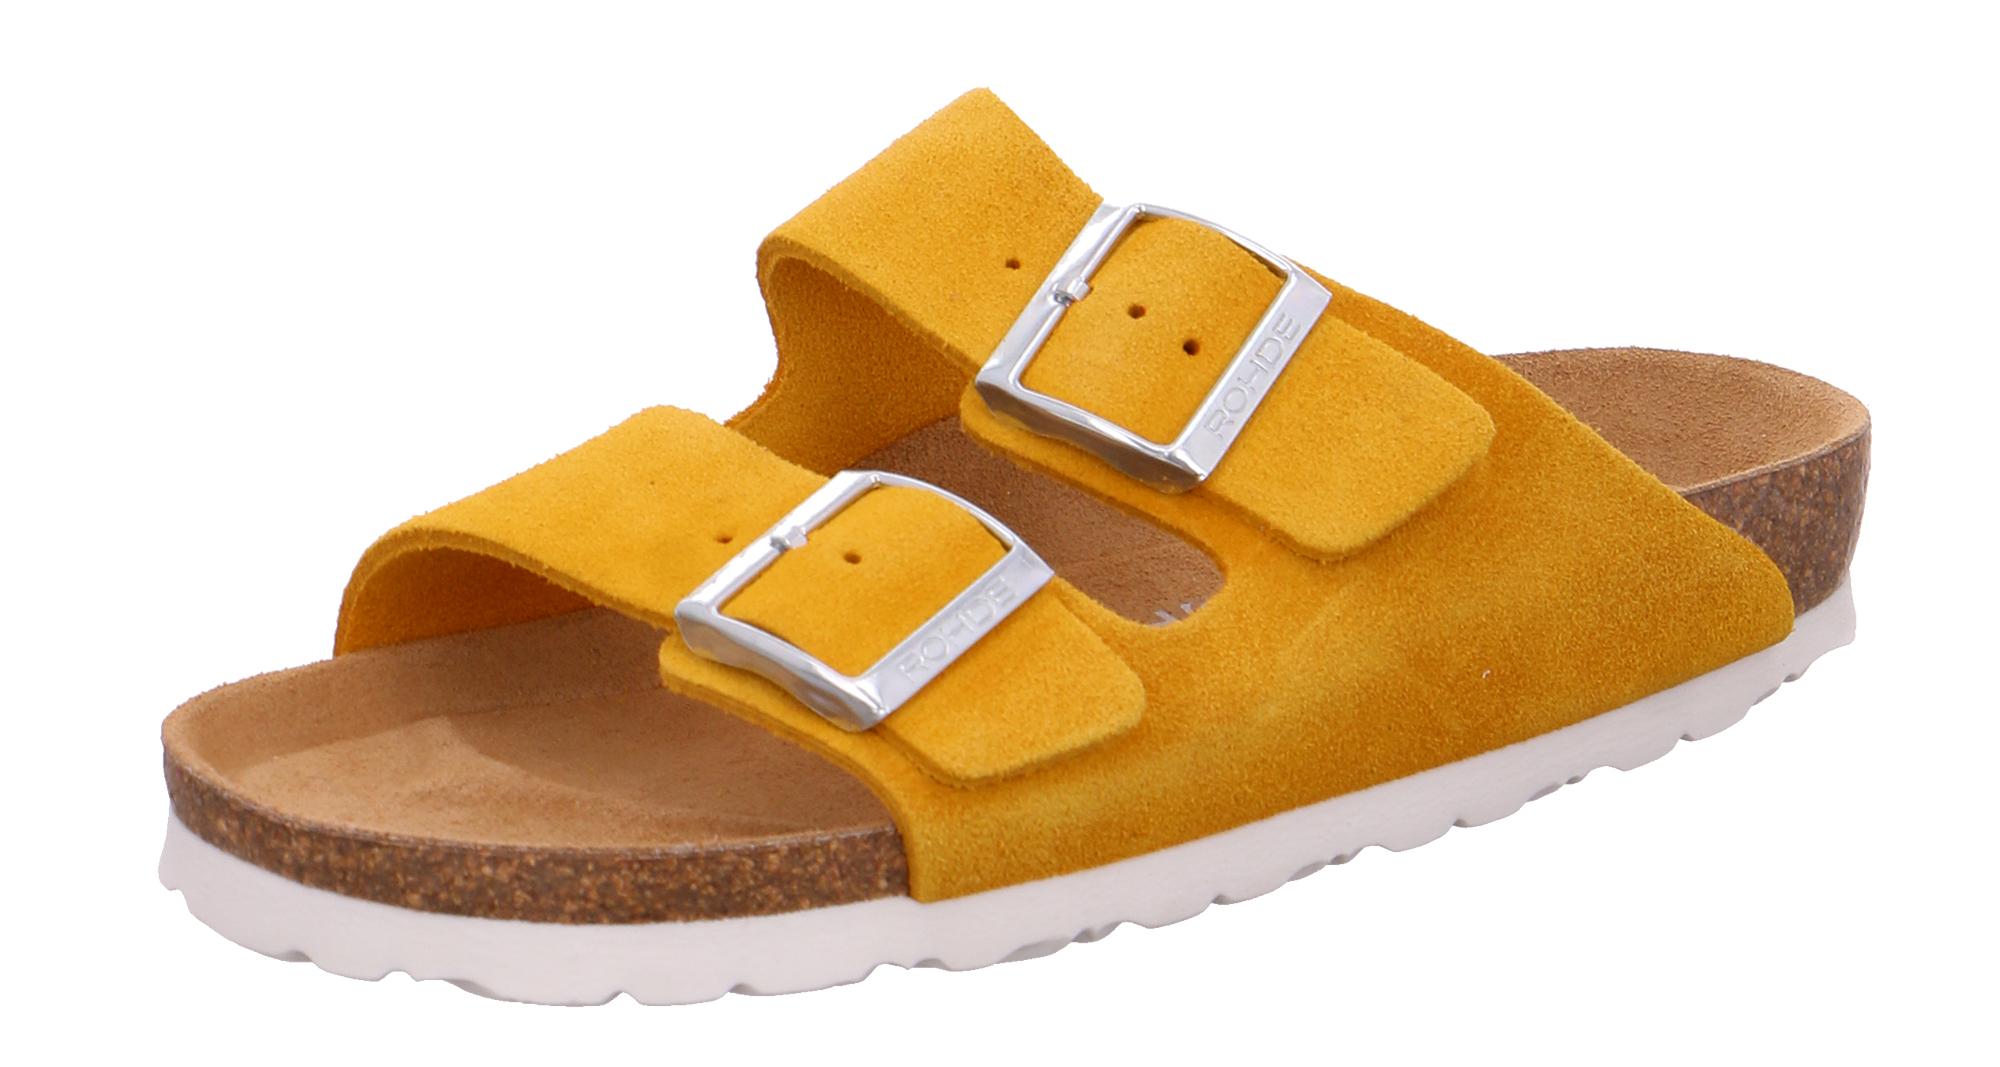 Rohde 5590 Alba Damen Schuhe Pantoletten Clogs Leder